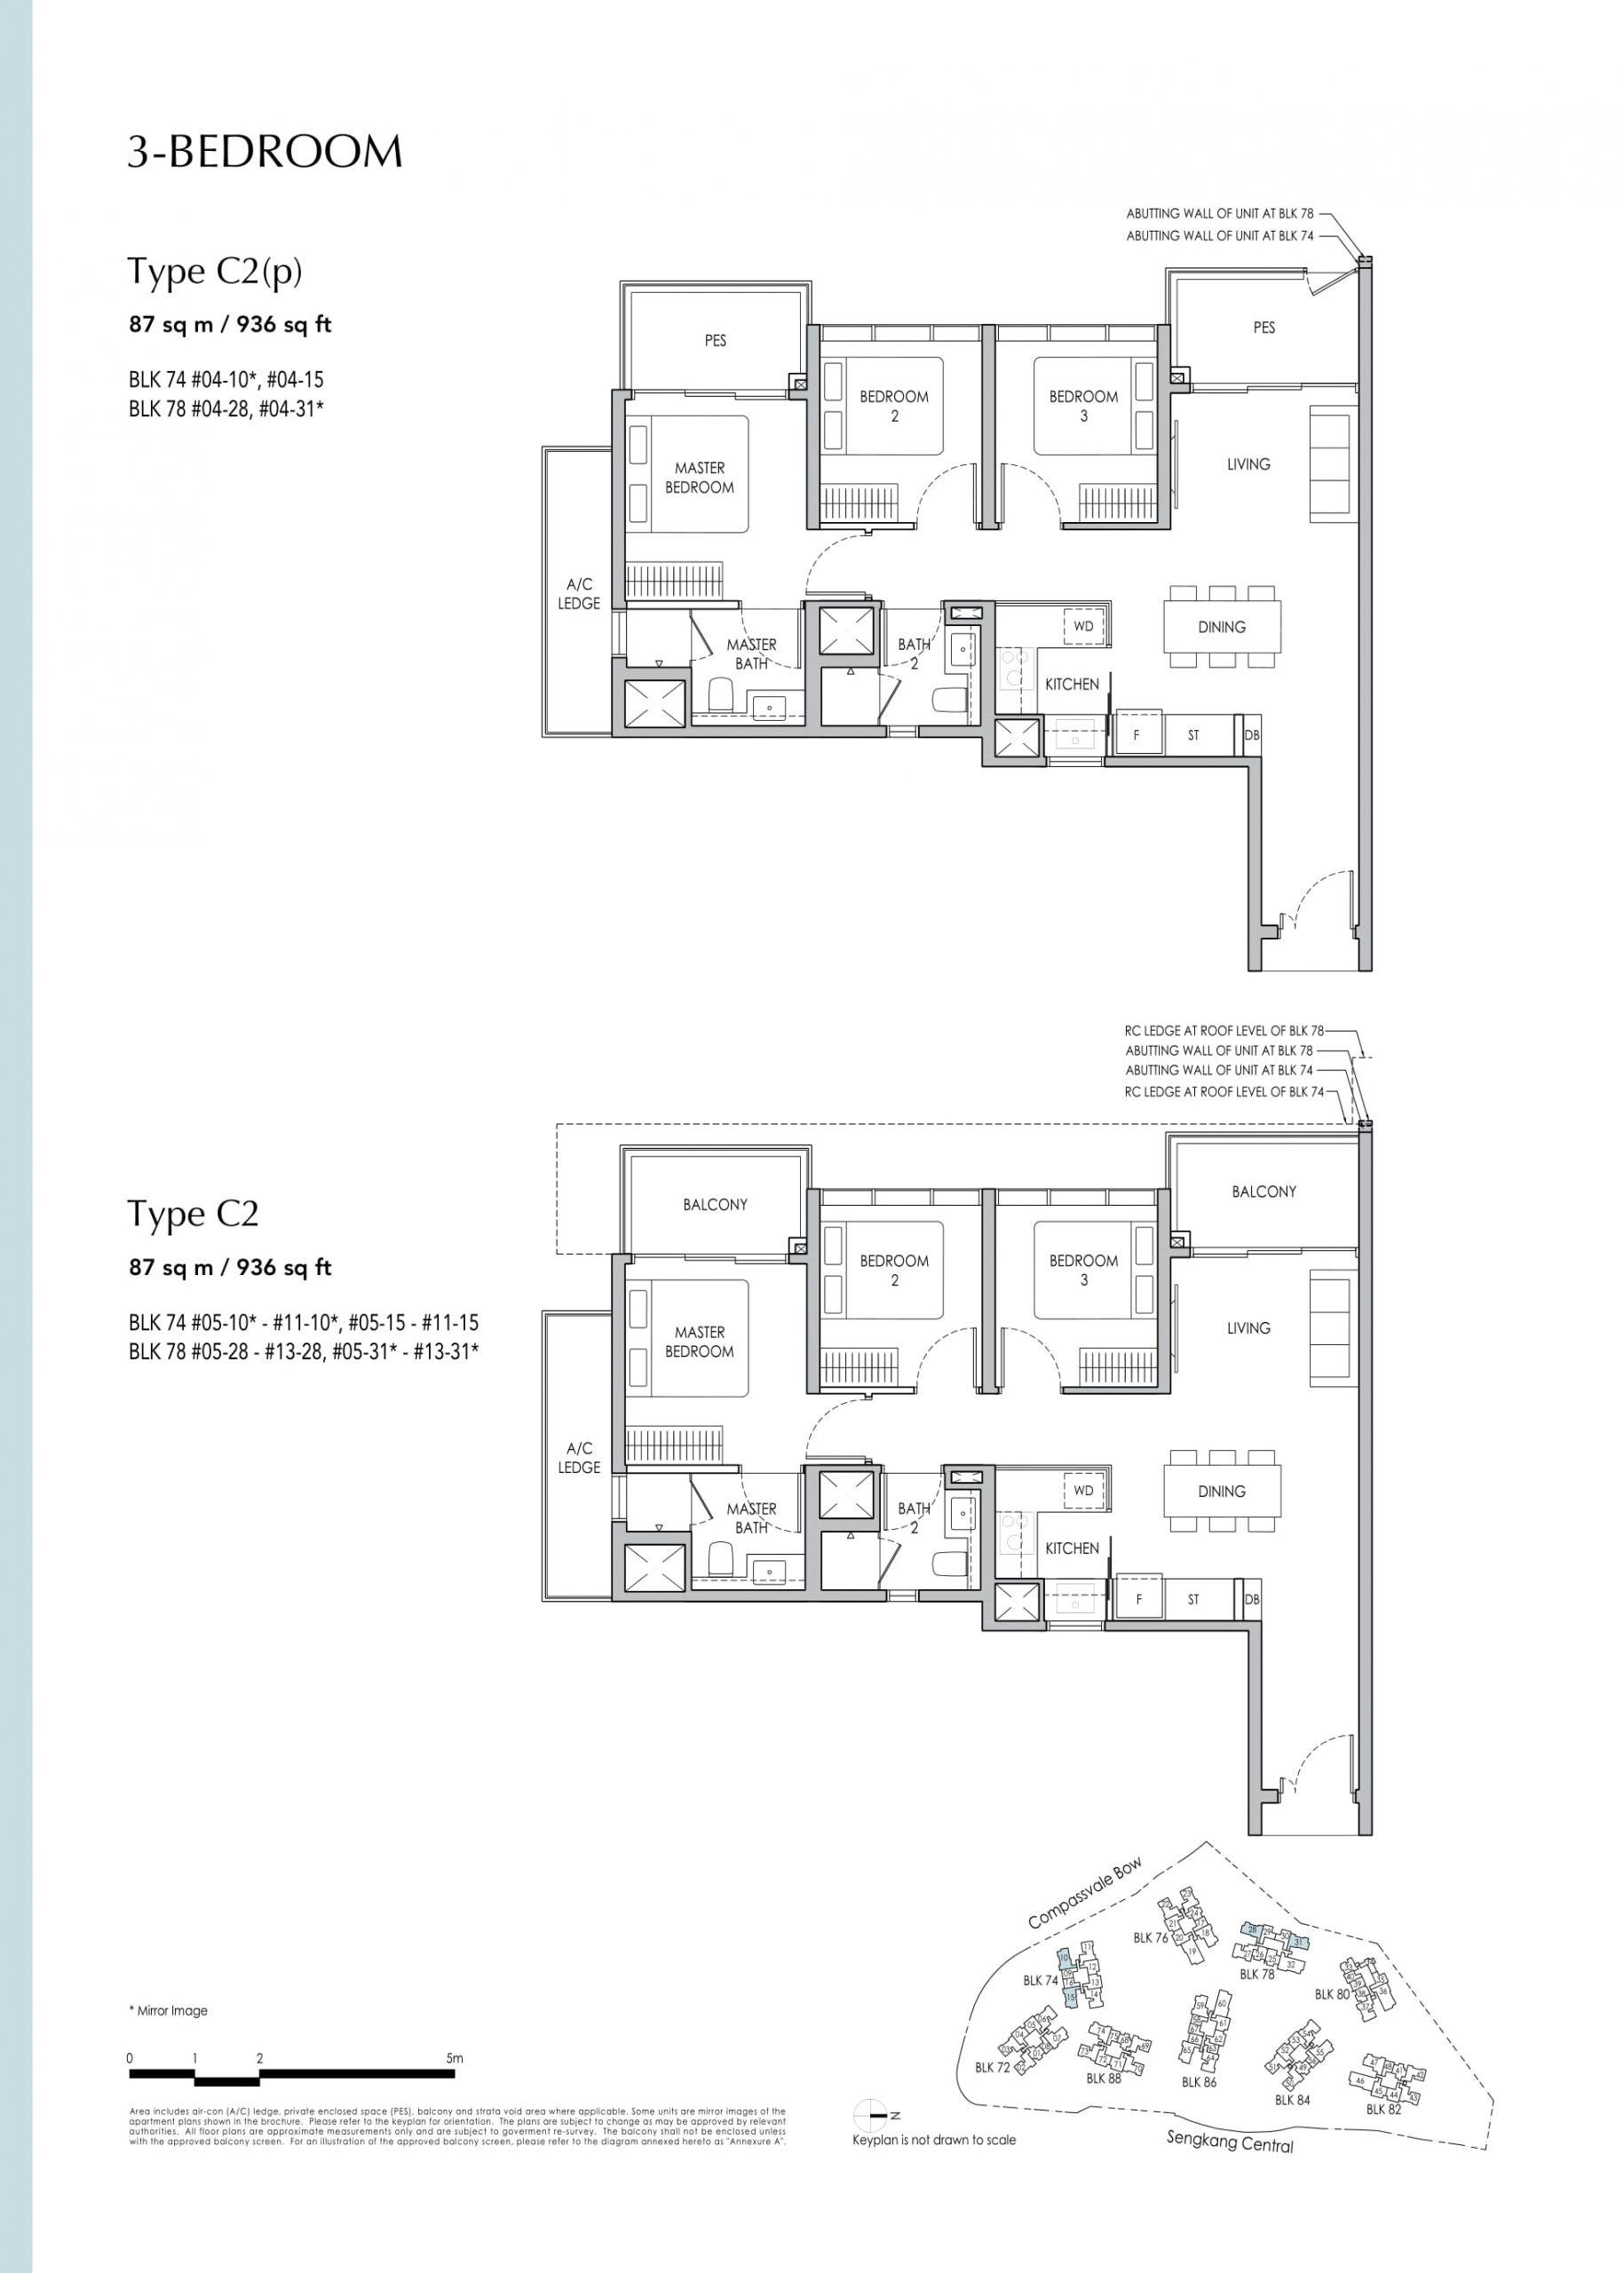 Sengkang Grand Residences' three-bedroom types